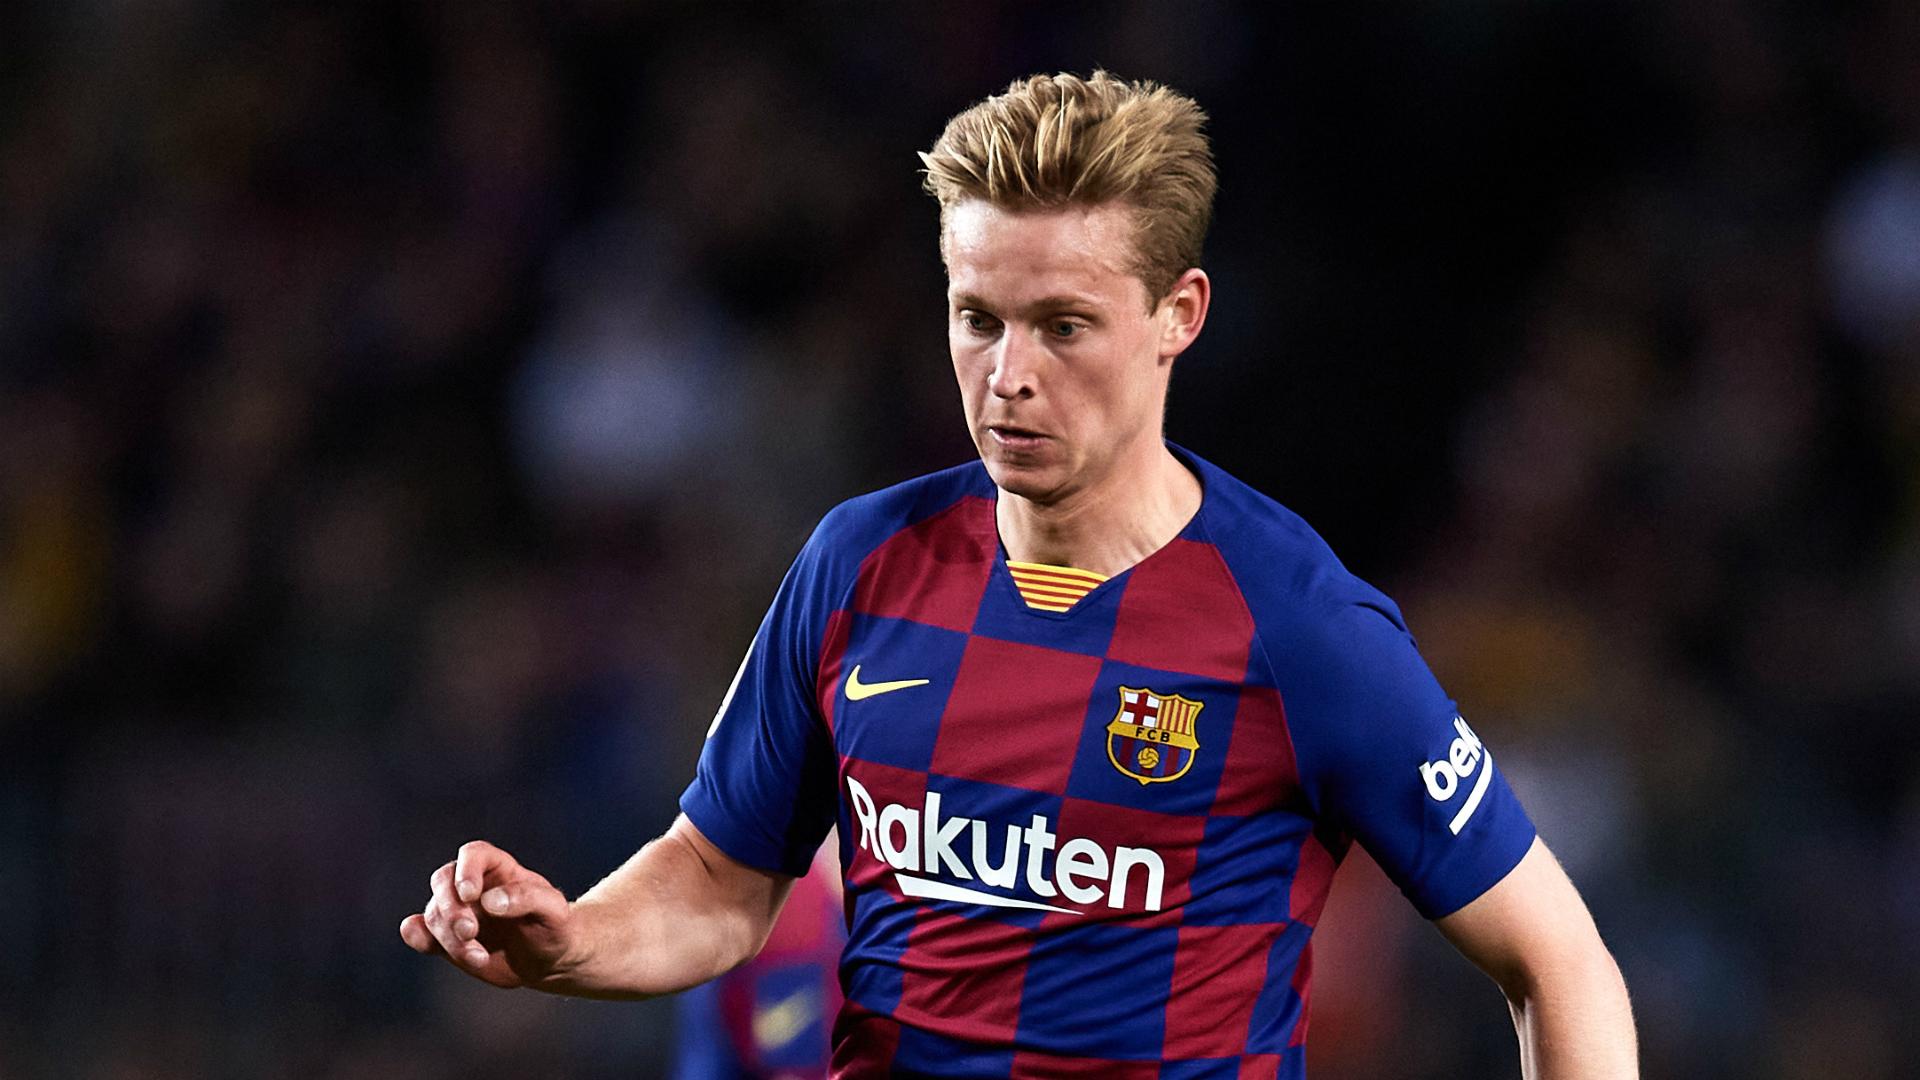 Barcelona confirm calf injury for Frenkie de Jong